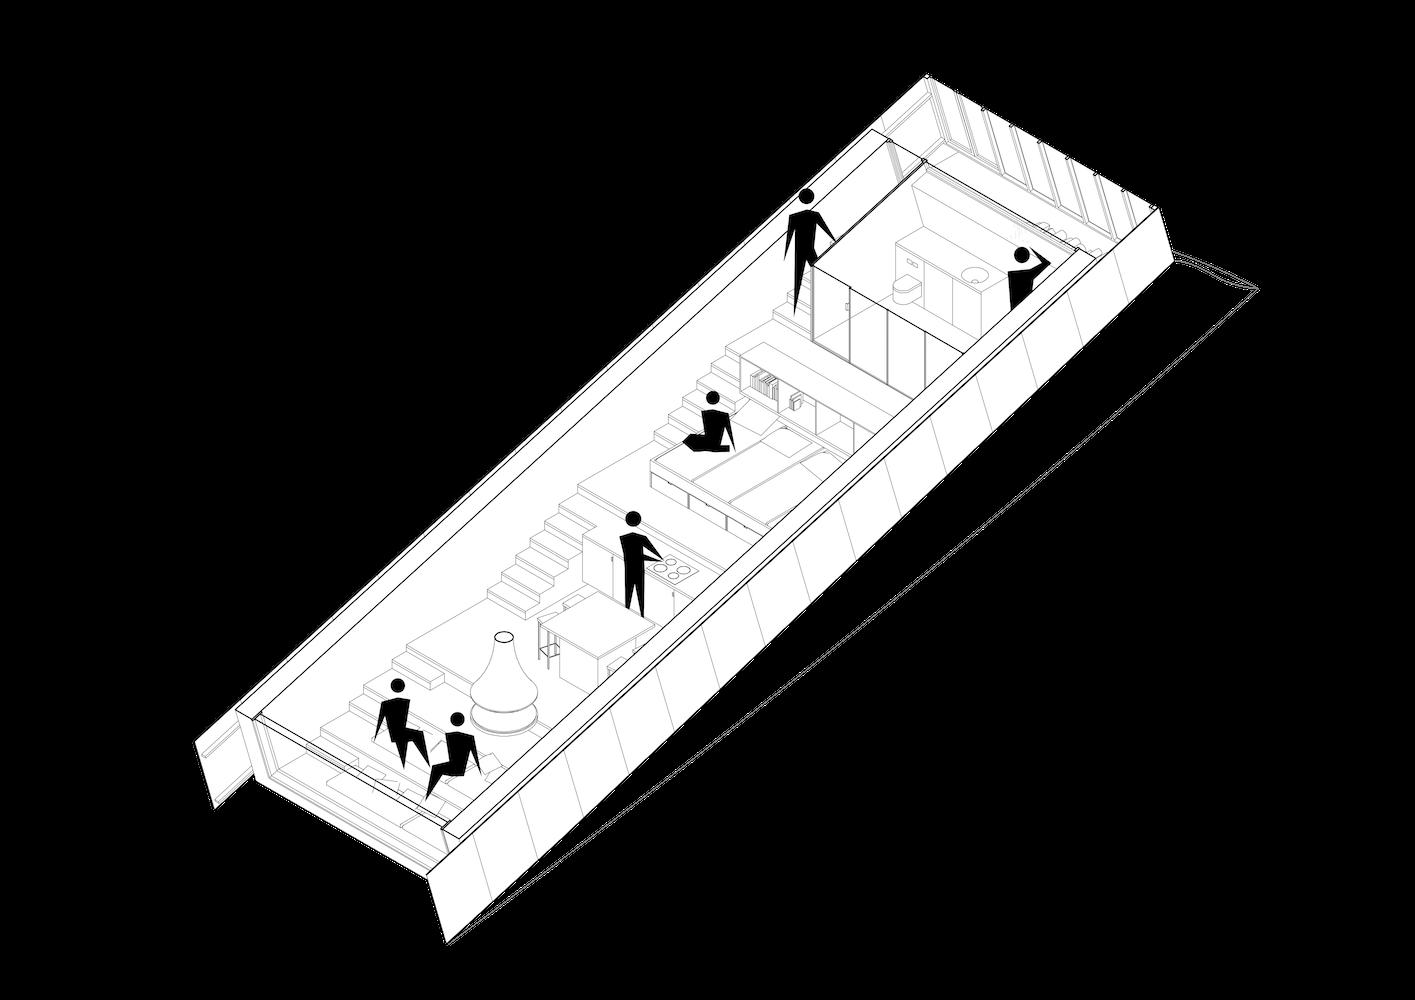 christophe-benichou-architectures-sliding-shelter-plan axo